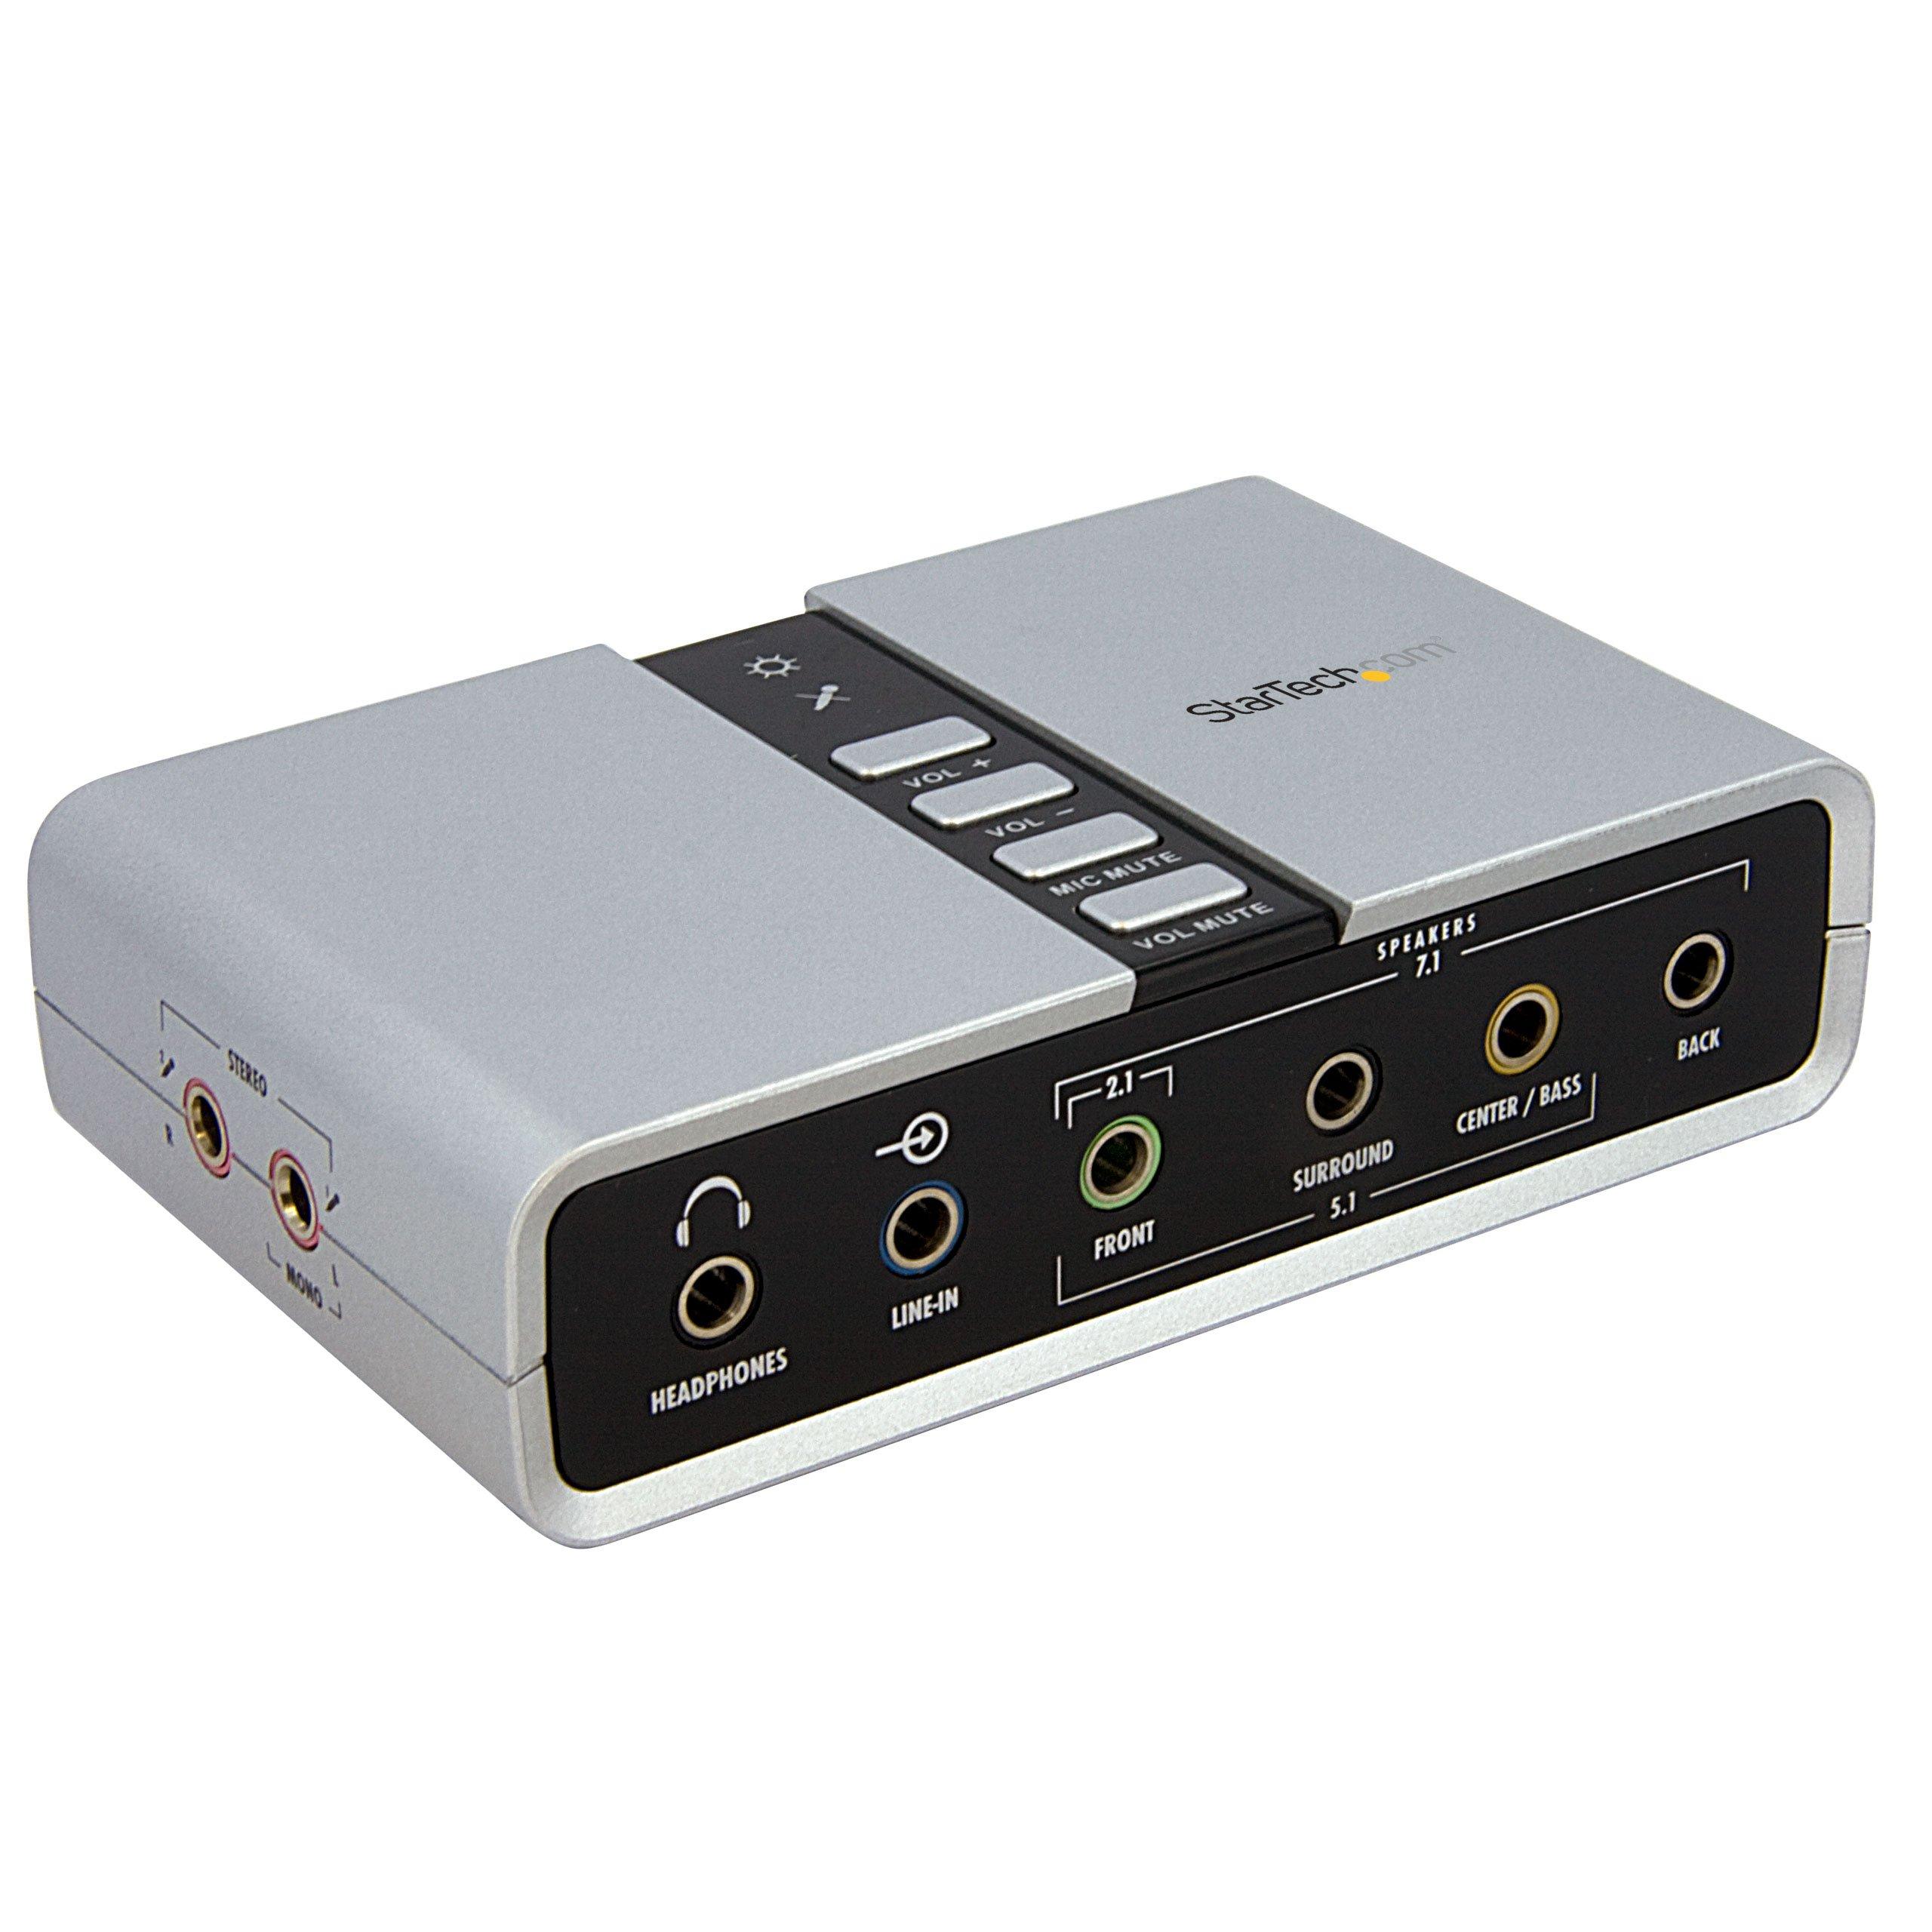 StarTech.com 7.1 USB Audio Adapter External Sound Card with SPDIF Digital Audio Sound Cards ICUSBAUDIO7D